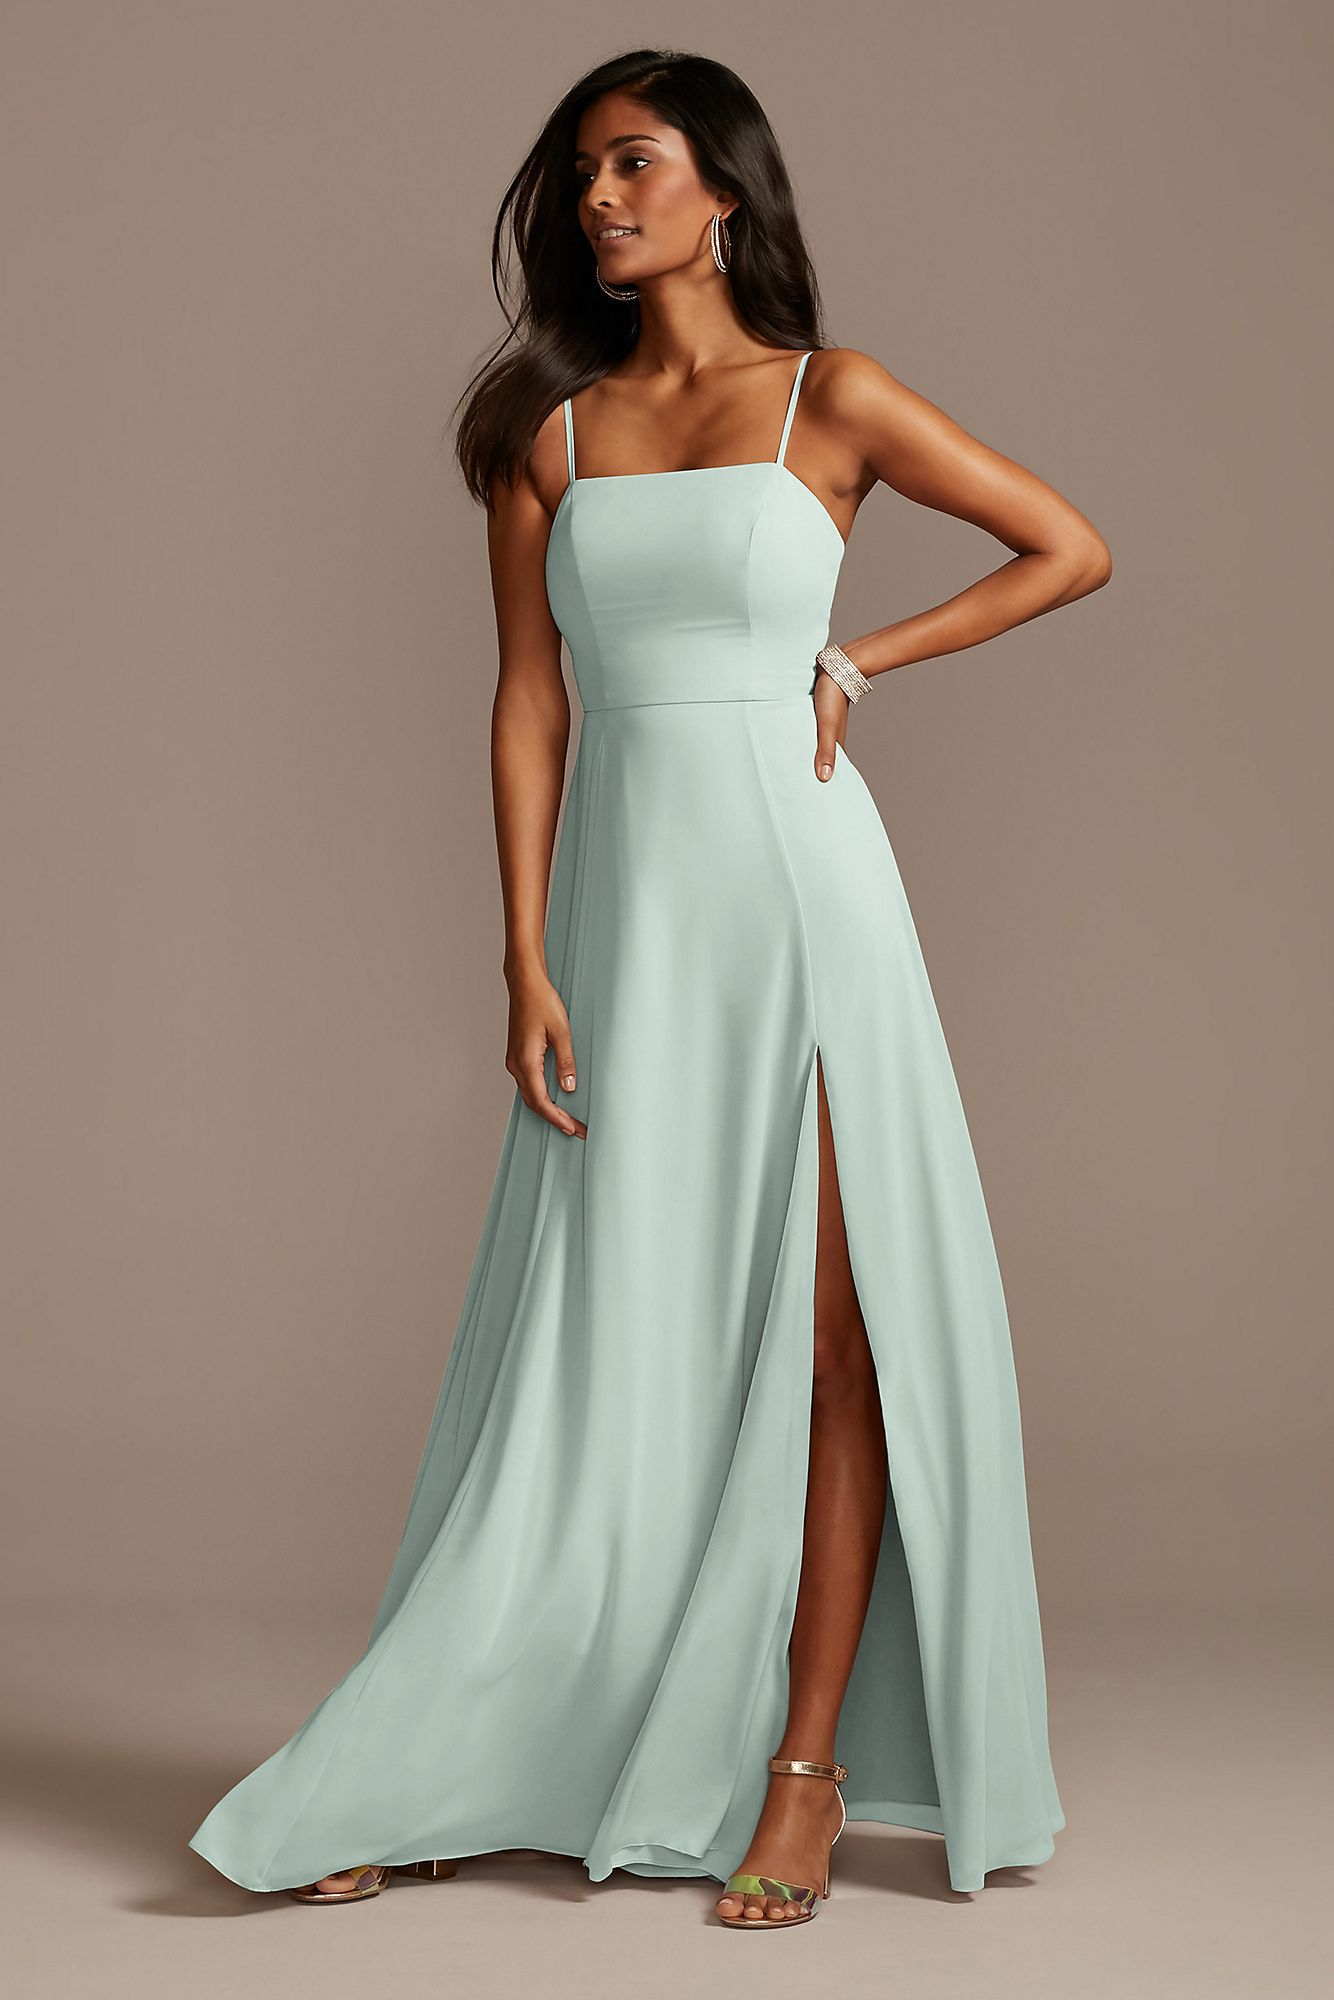 light green bridesmaid dress